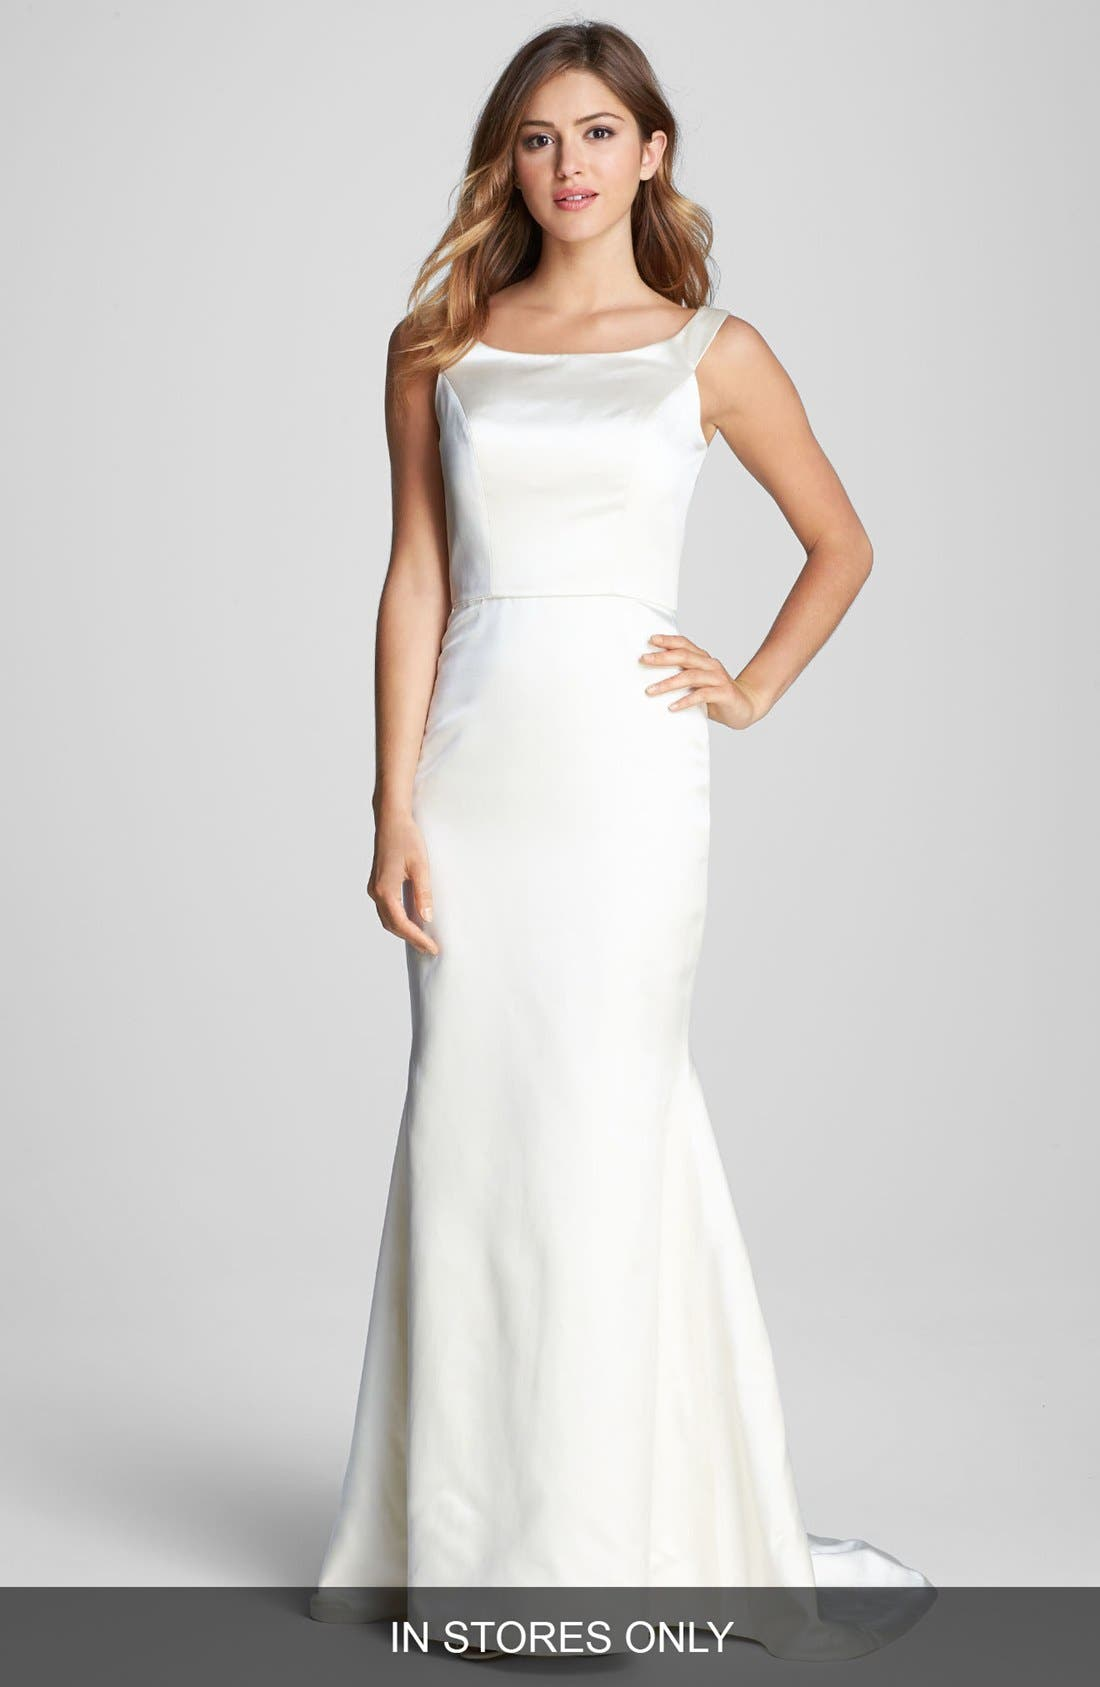 Main Image - Caroline DeVillo 'Lauren' Silk Trumpet Dress (In Stores Only)